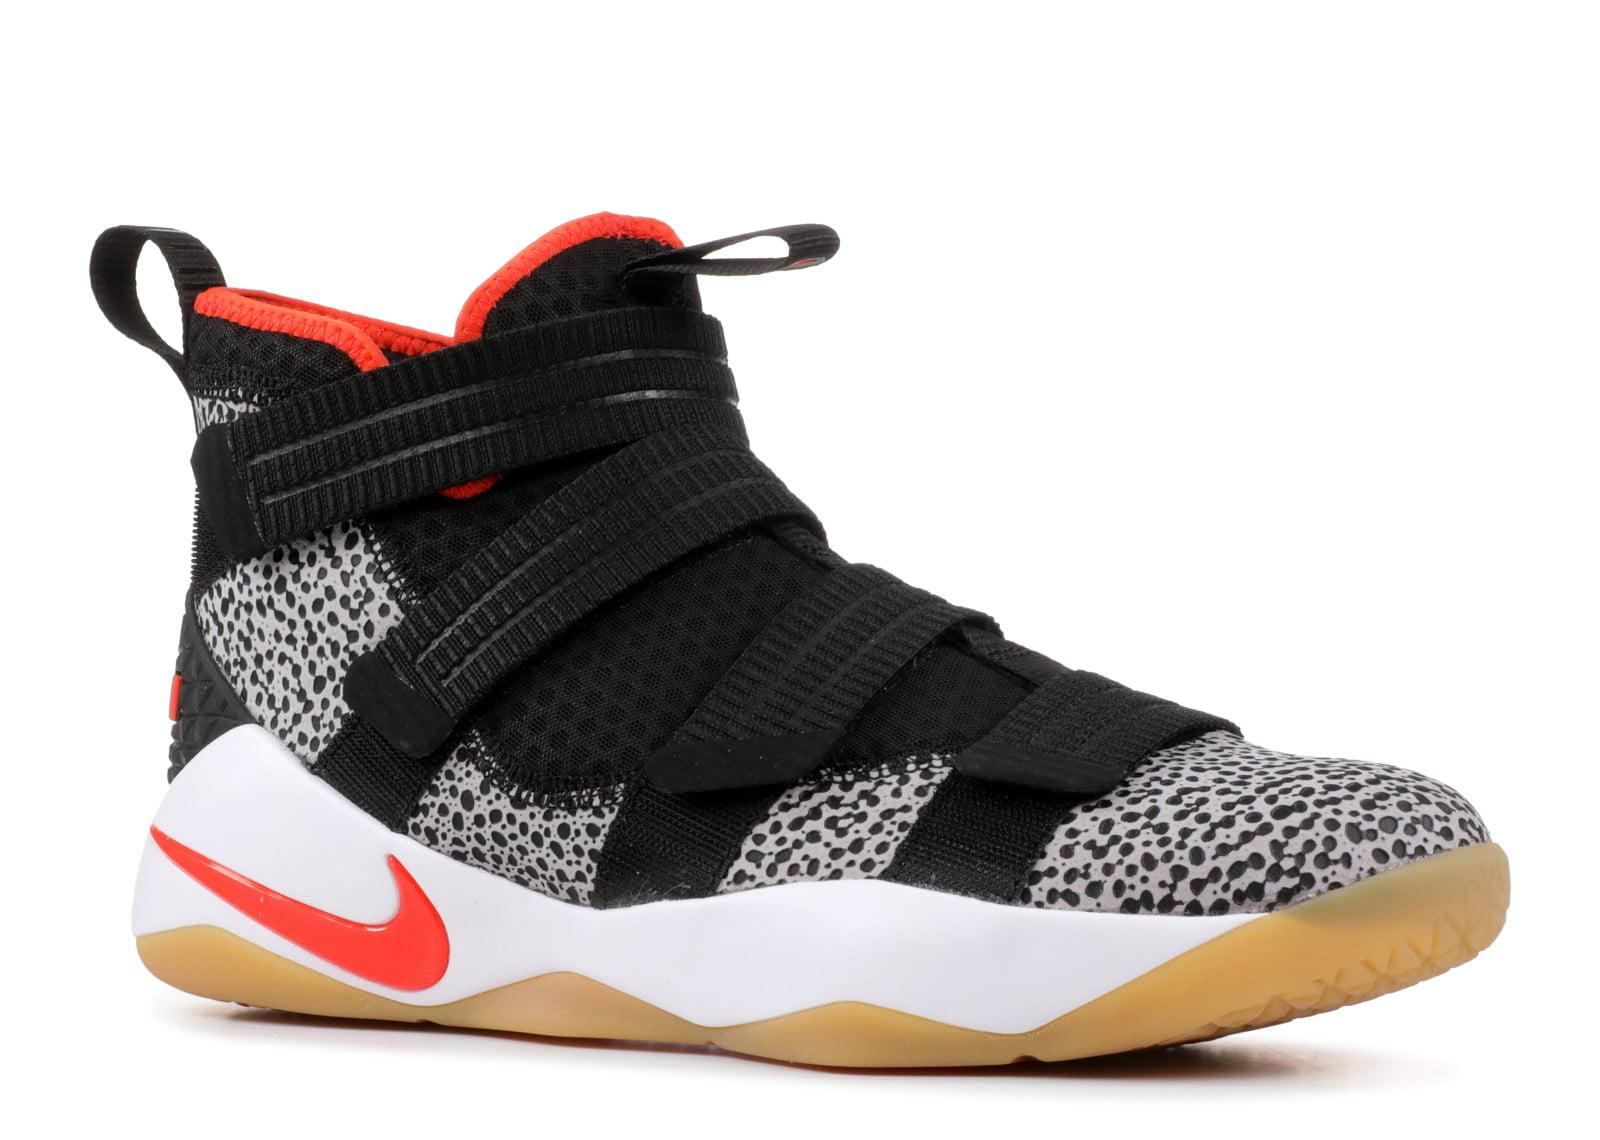 55e587c20b5 Nike - Men - Lebron Soldier Xi Sfg - 897646-006 - Size 13